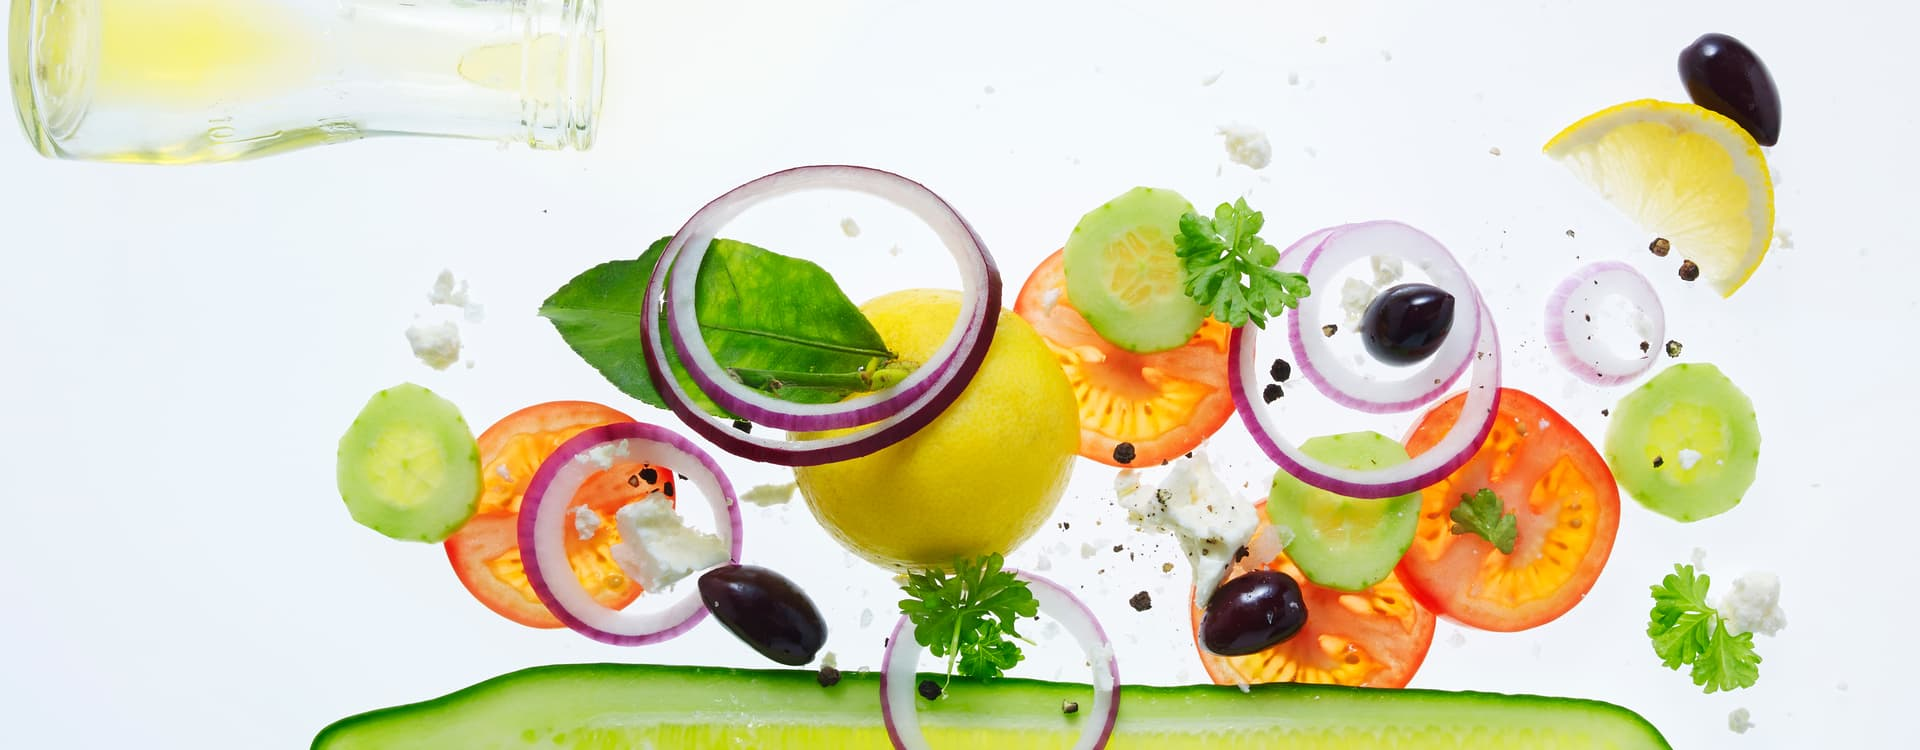 Klassisk gresk salat